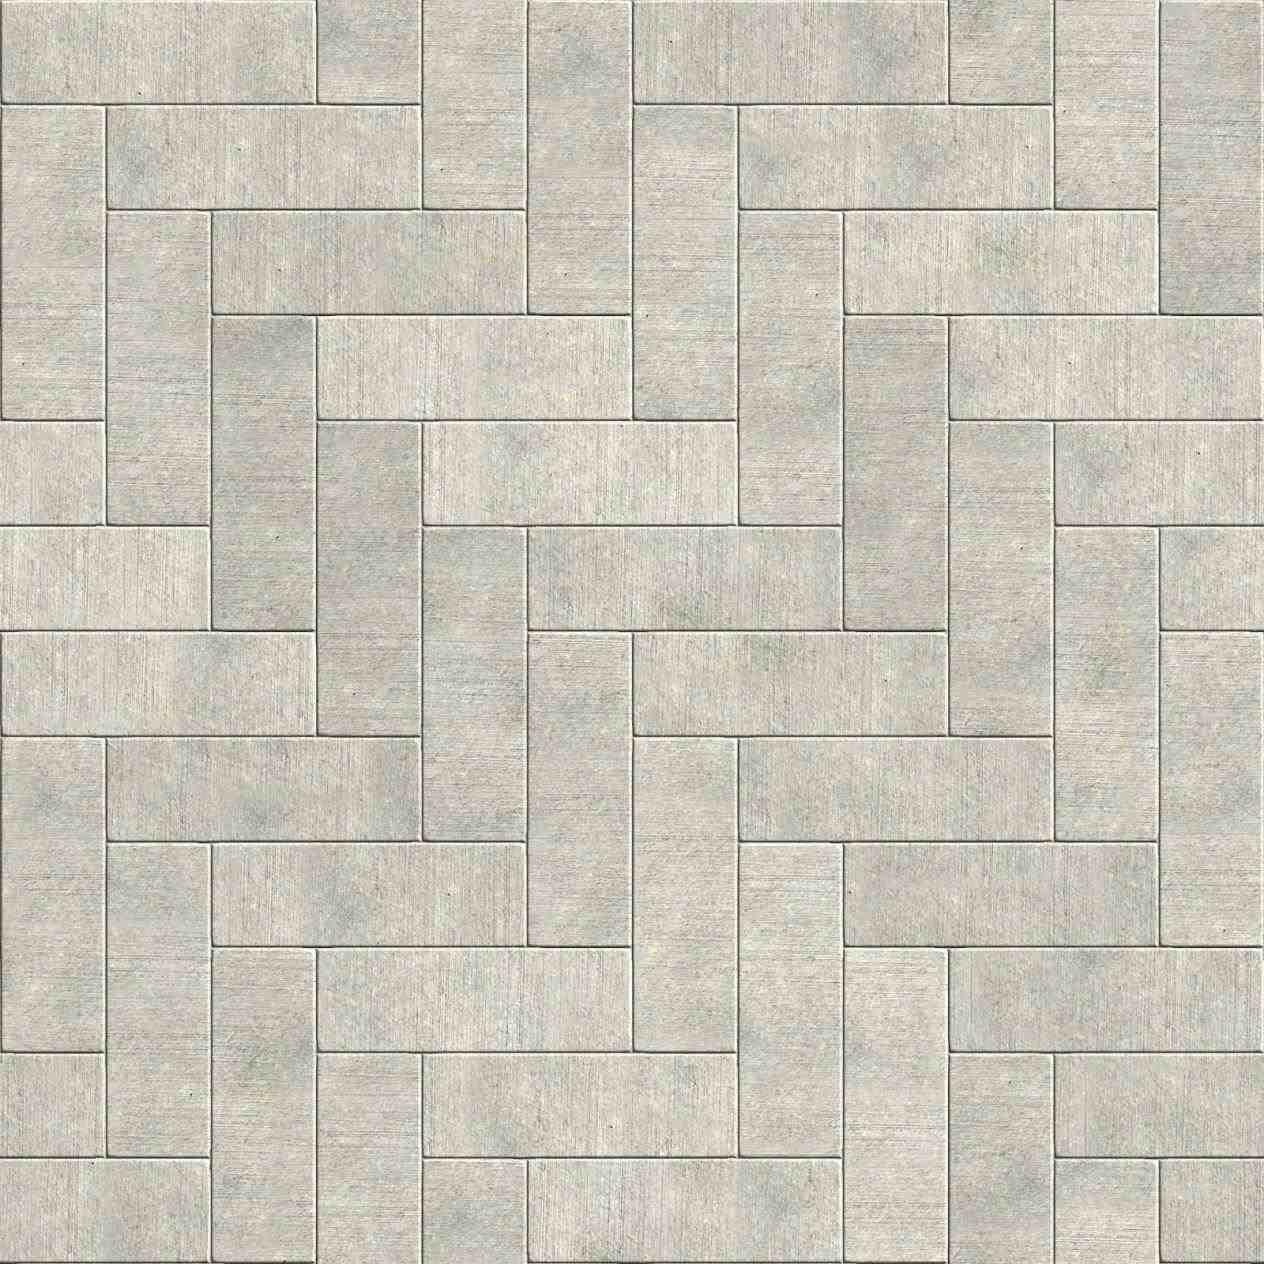 stone bathroom flooring texture. New Bathroom Floor Texture Seamless At Xx16.info Stone Flooring